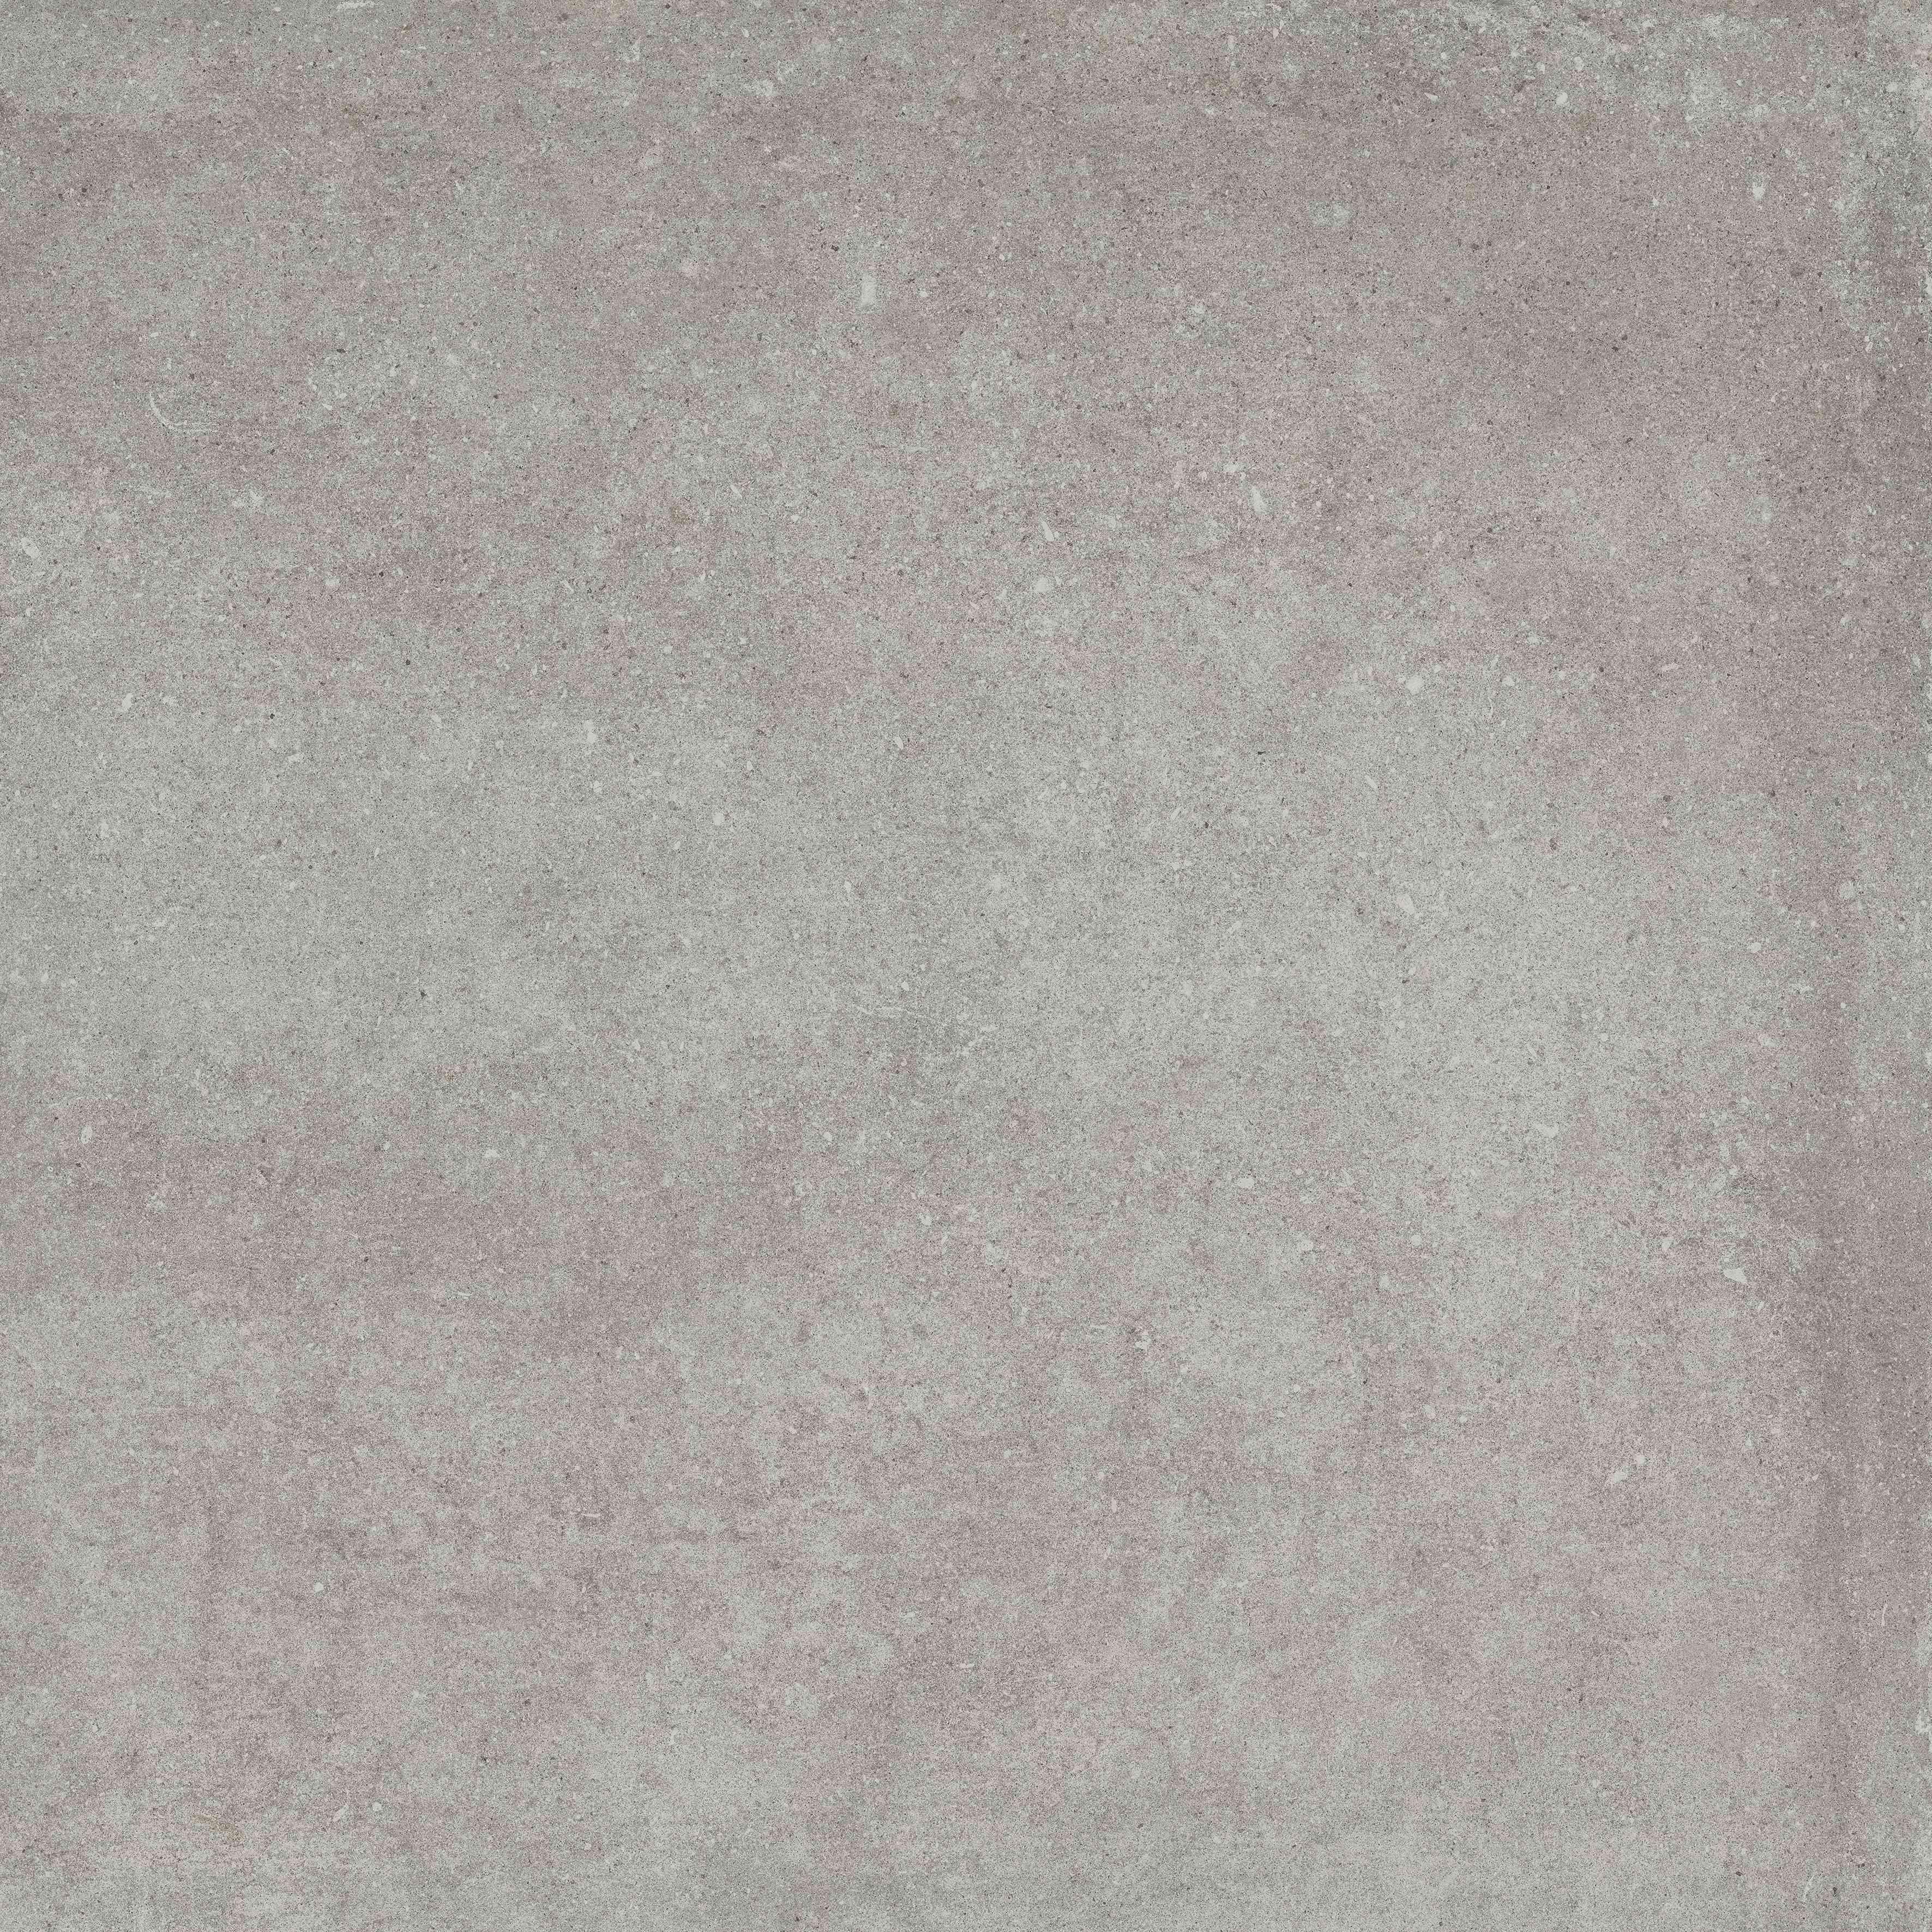 Плитка GRIGIO (ZRXRM8R) изображение 5